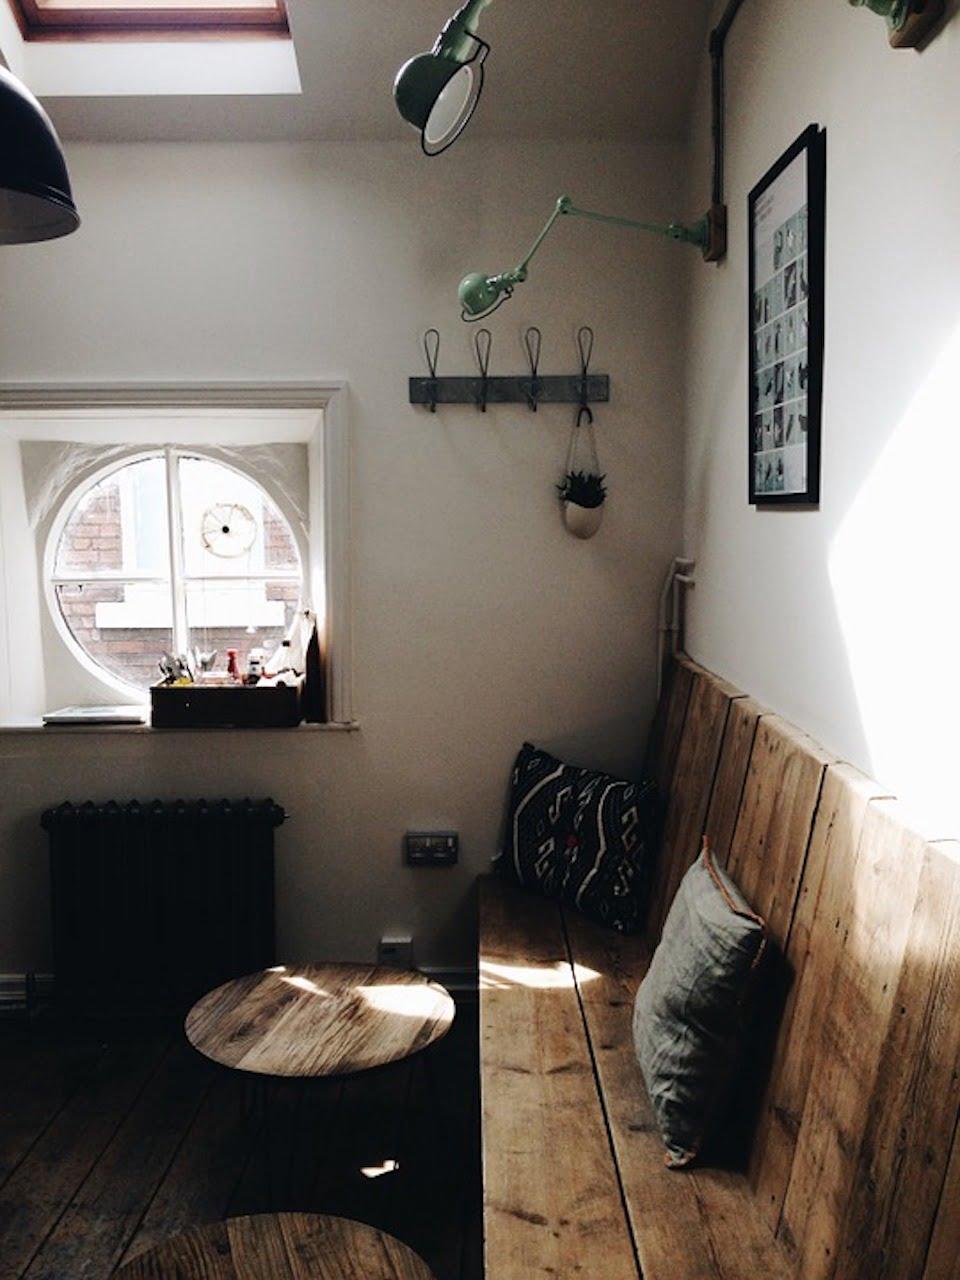 Arredamento Fai Da Te mobili fai da te: arredare casa (quasi) gratis